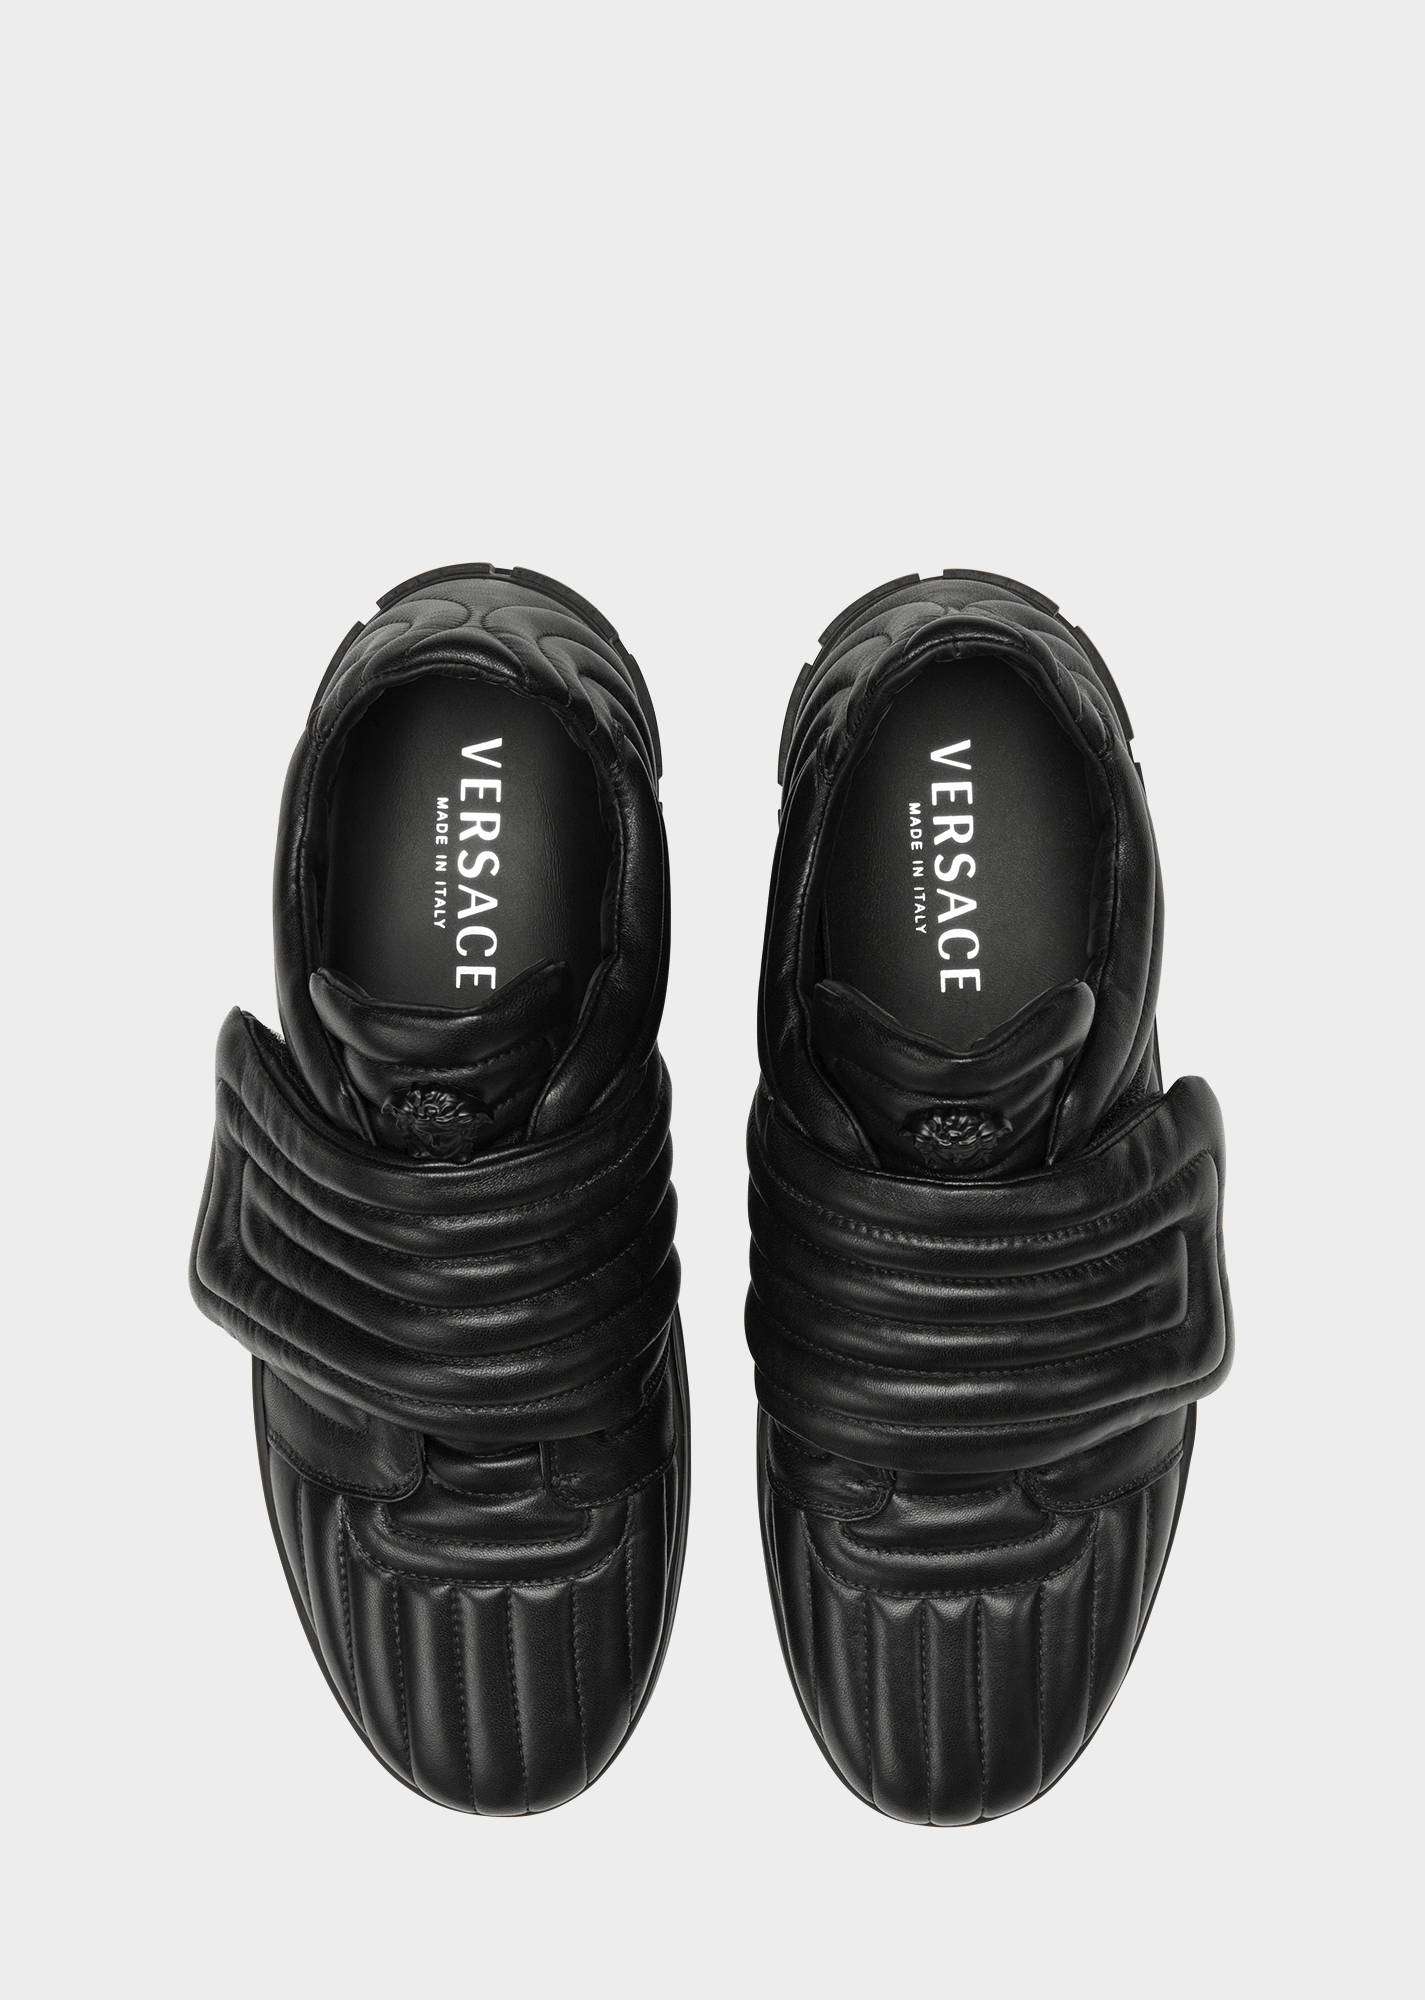 Sneaker trapuntate con Chiave Greca - D41 Sneakers